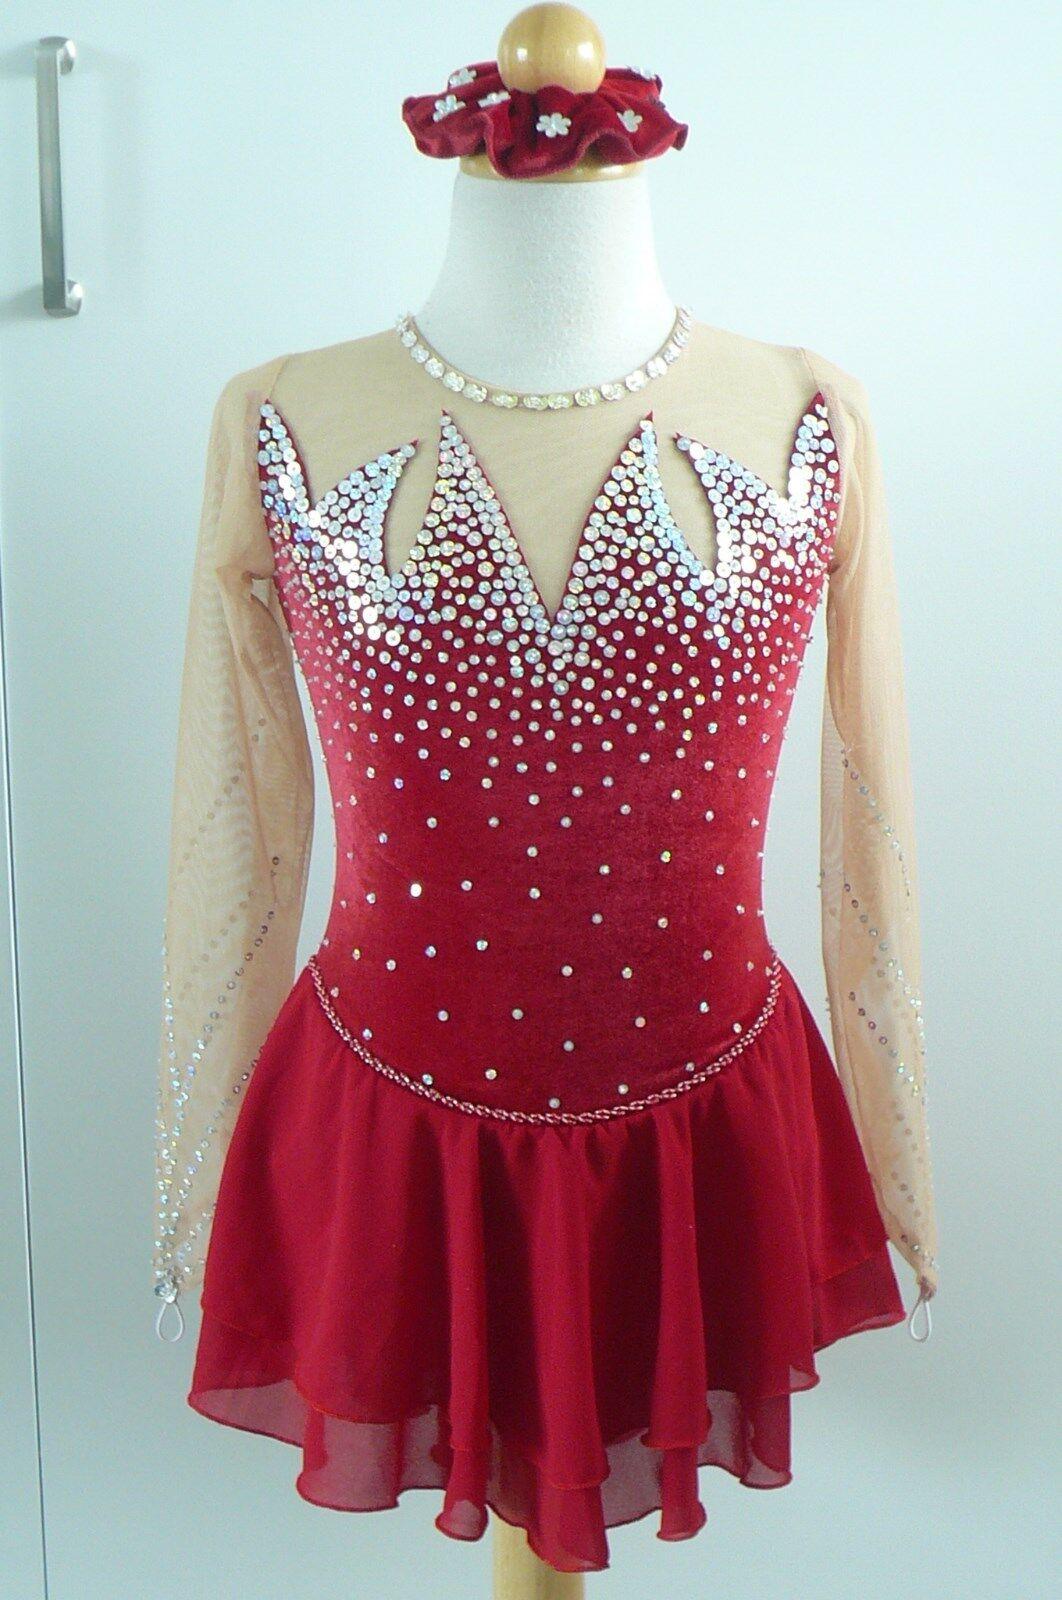 Kim Competition Ice Skating Dress Adult  Medium  quality product